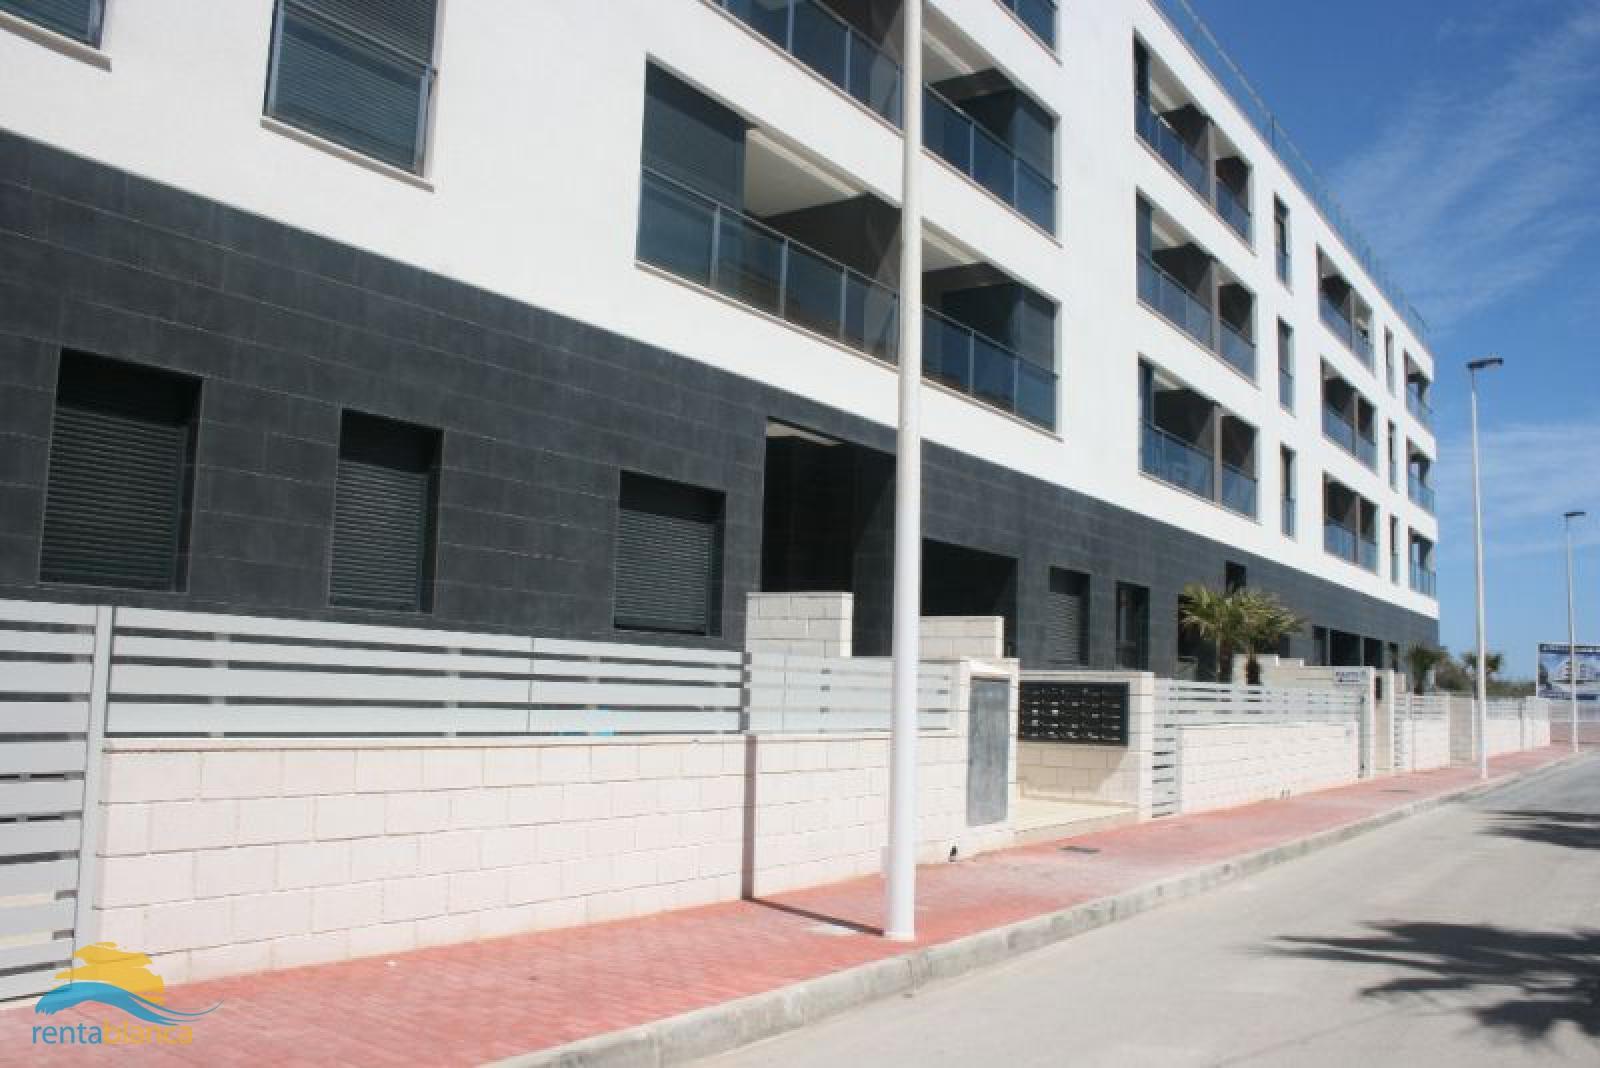 Appartement Pinada beach III - Rentablanca